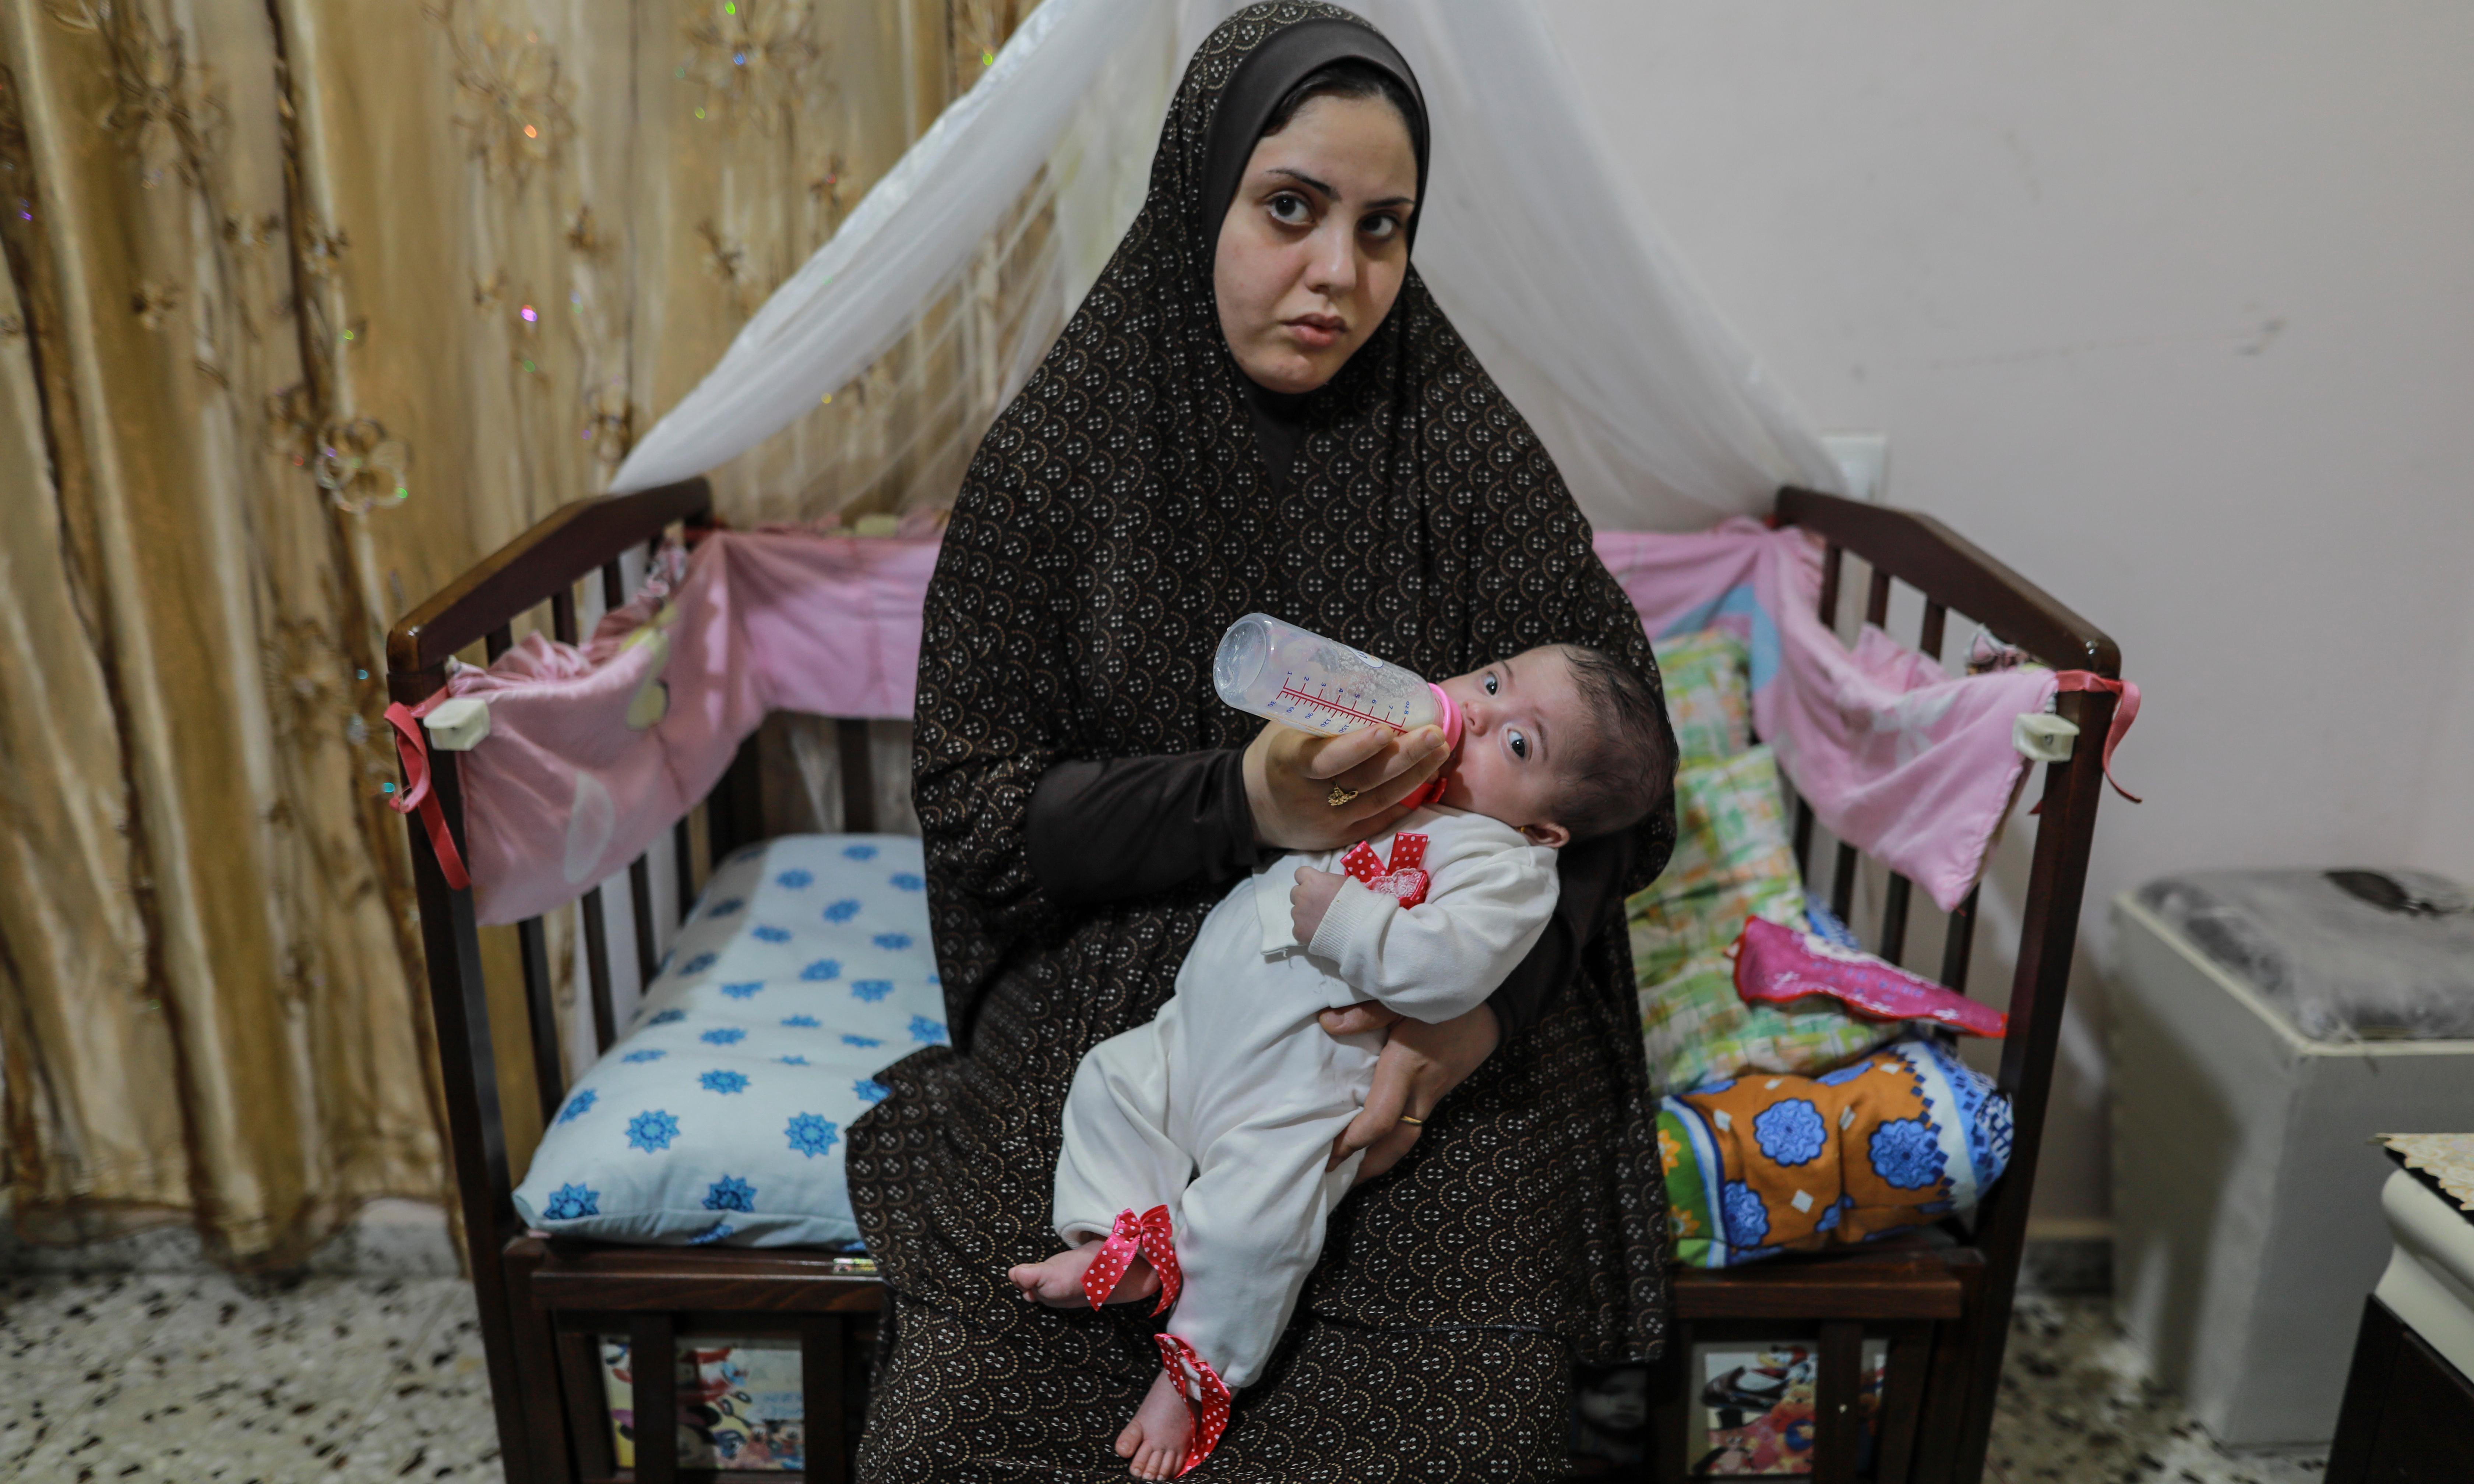 A Jerusalem hospital where Palestinian babies die alone